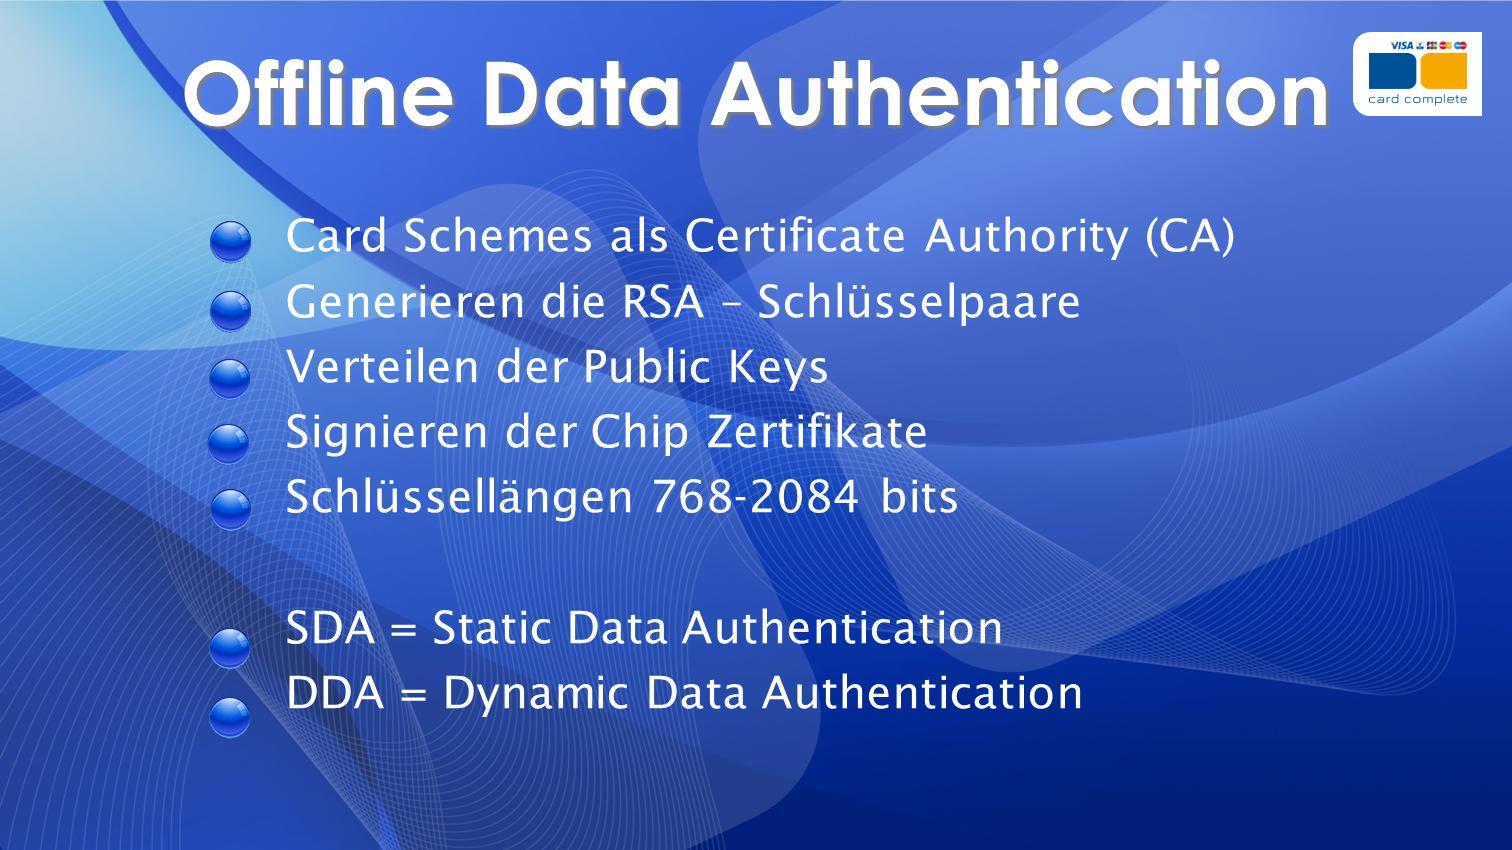 Offline Data Authentication